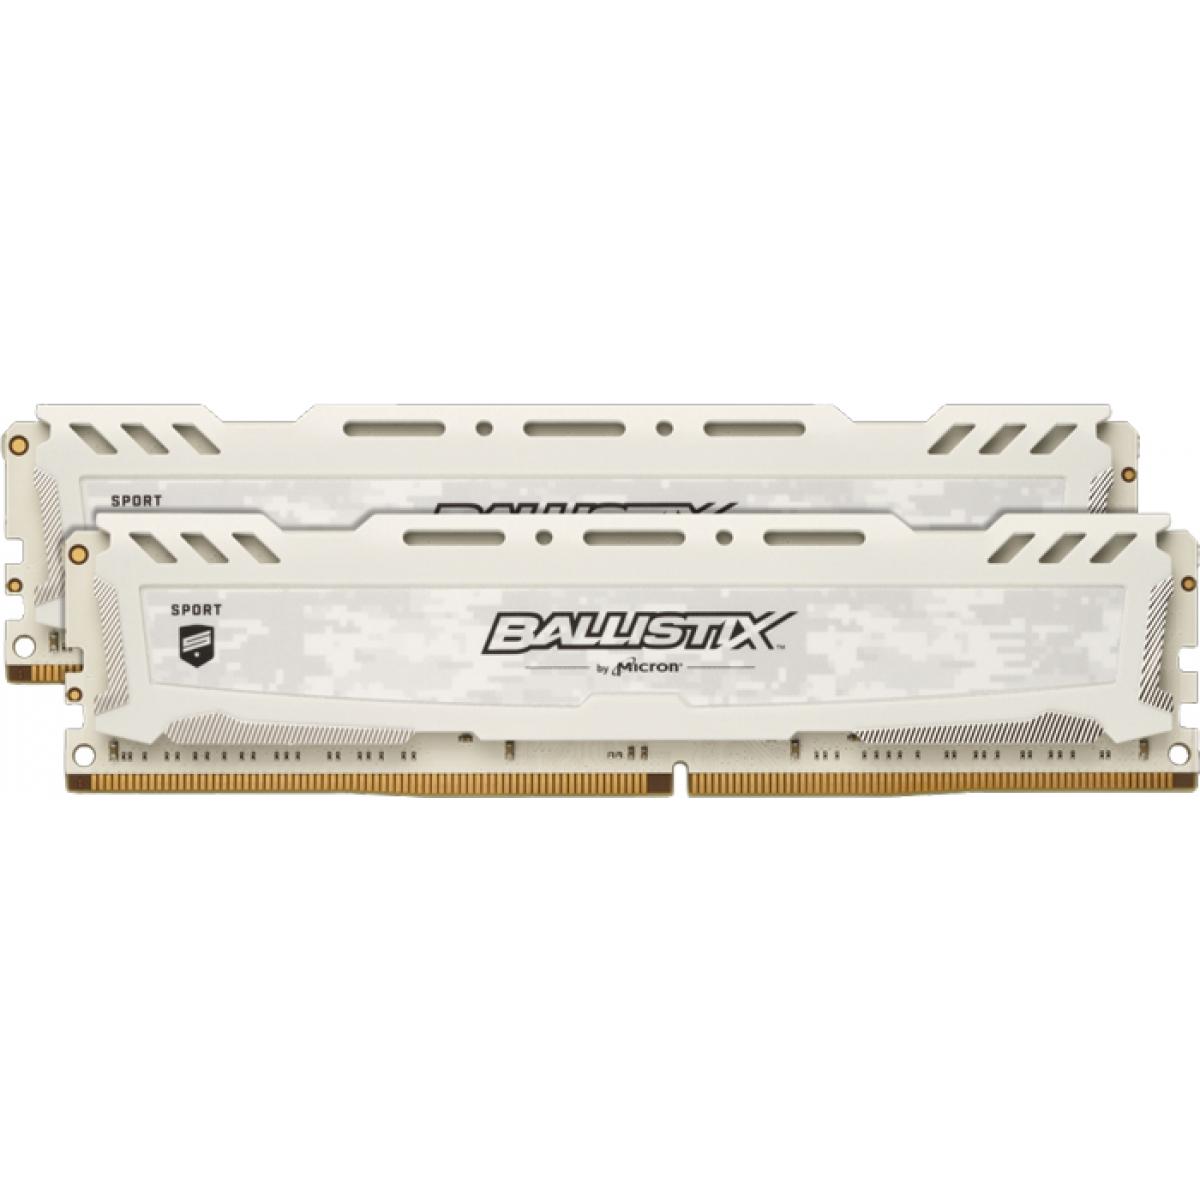 Memória DDR4 Crucial Ballistix Sport Lt, 16GB (2x8GB) 3000MHz, White, BLS2K8G4D30AESCK